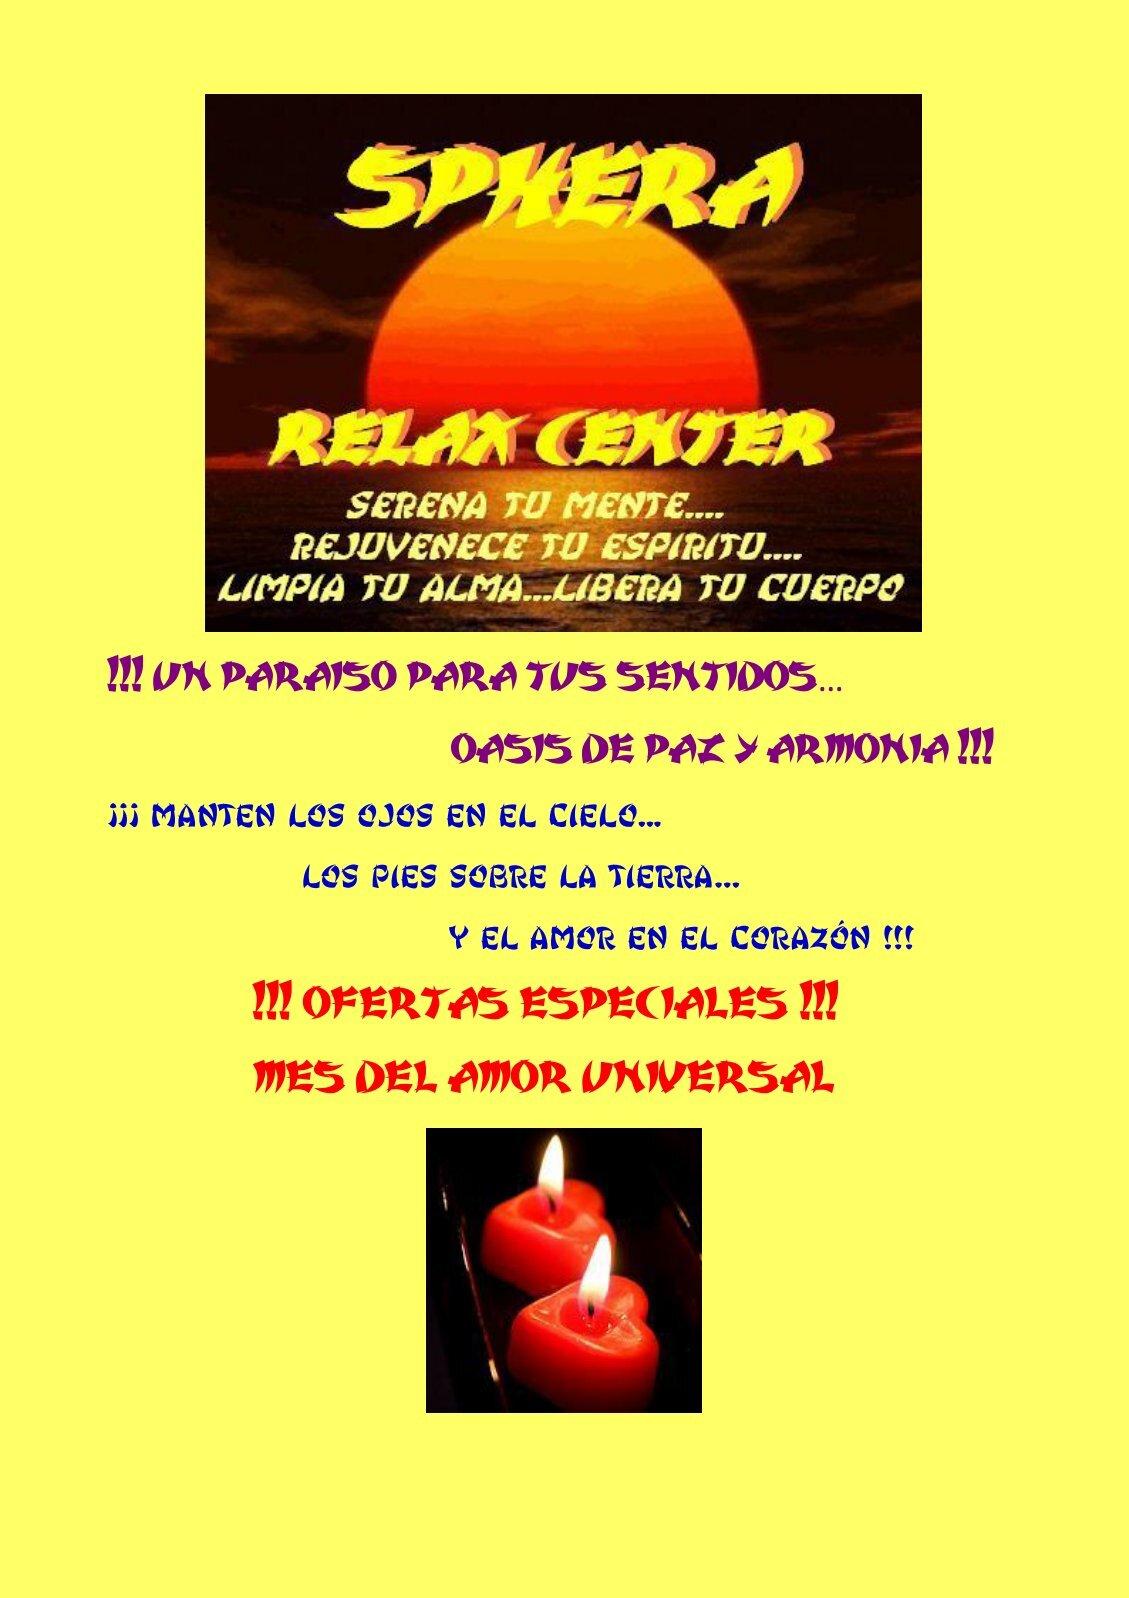 Sphera relax center opiniones